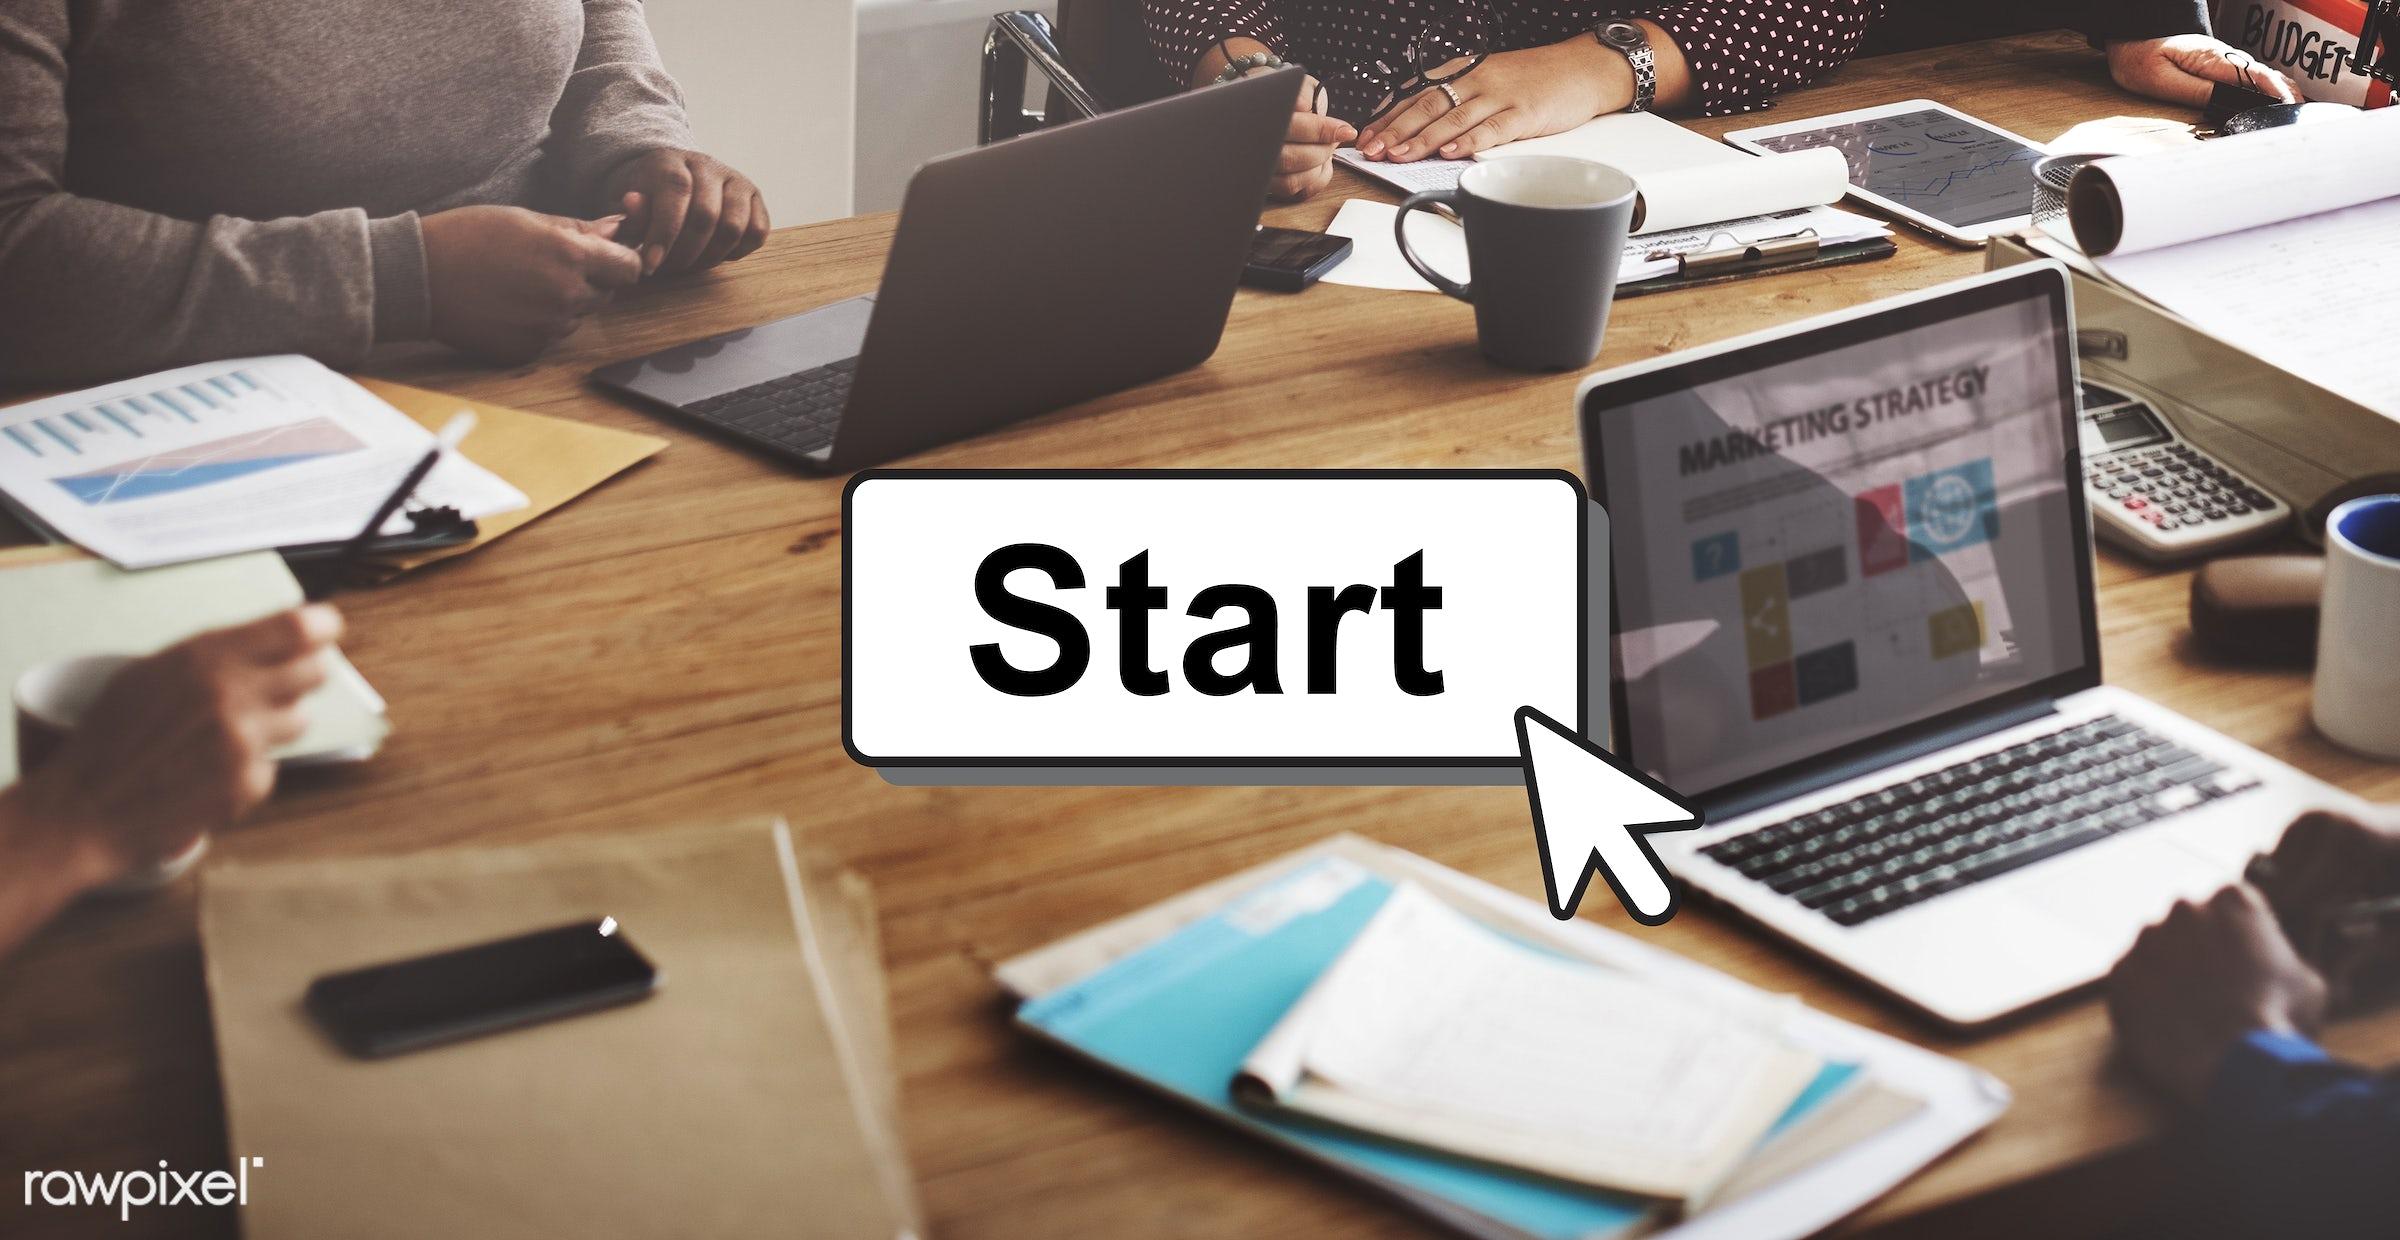 activation, analyzing, begin, beginning, brainstorming, briefing, build, business, businessmen, businesswomen, colleagues,...